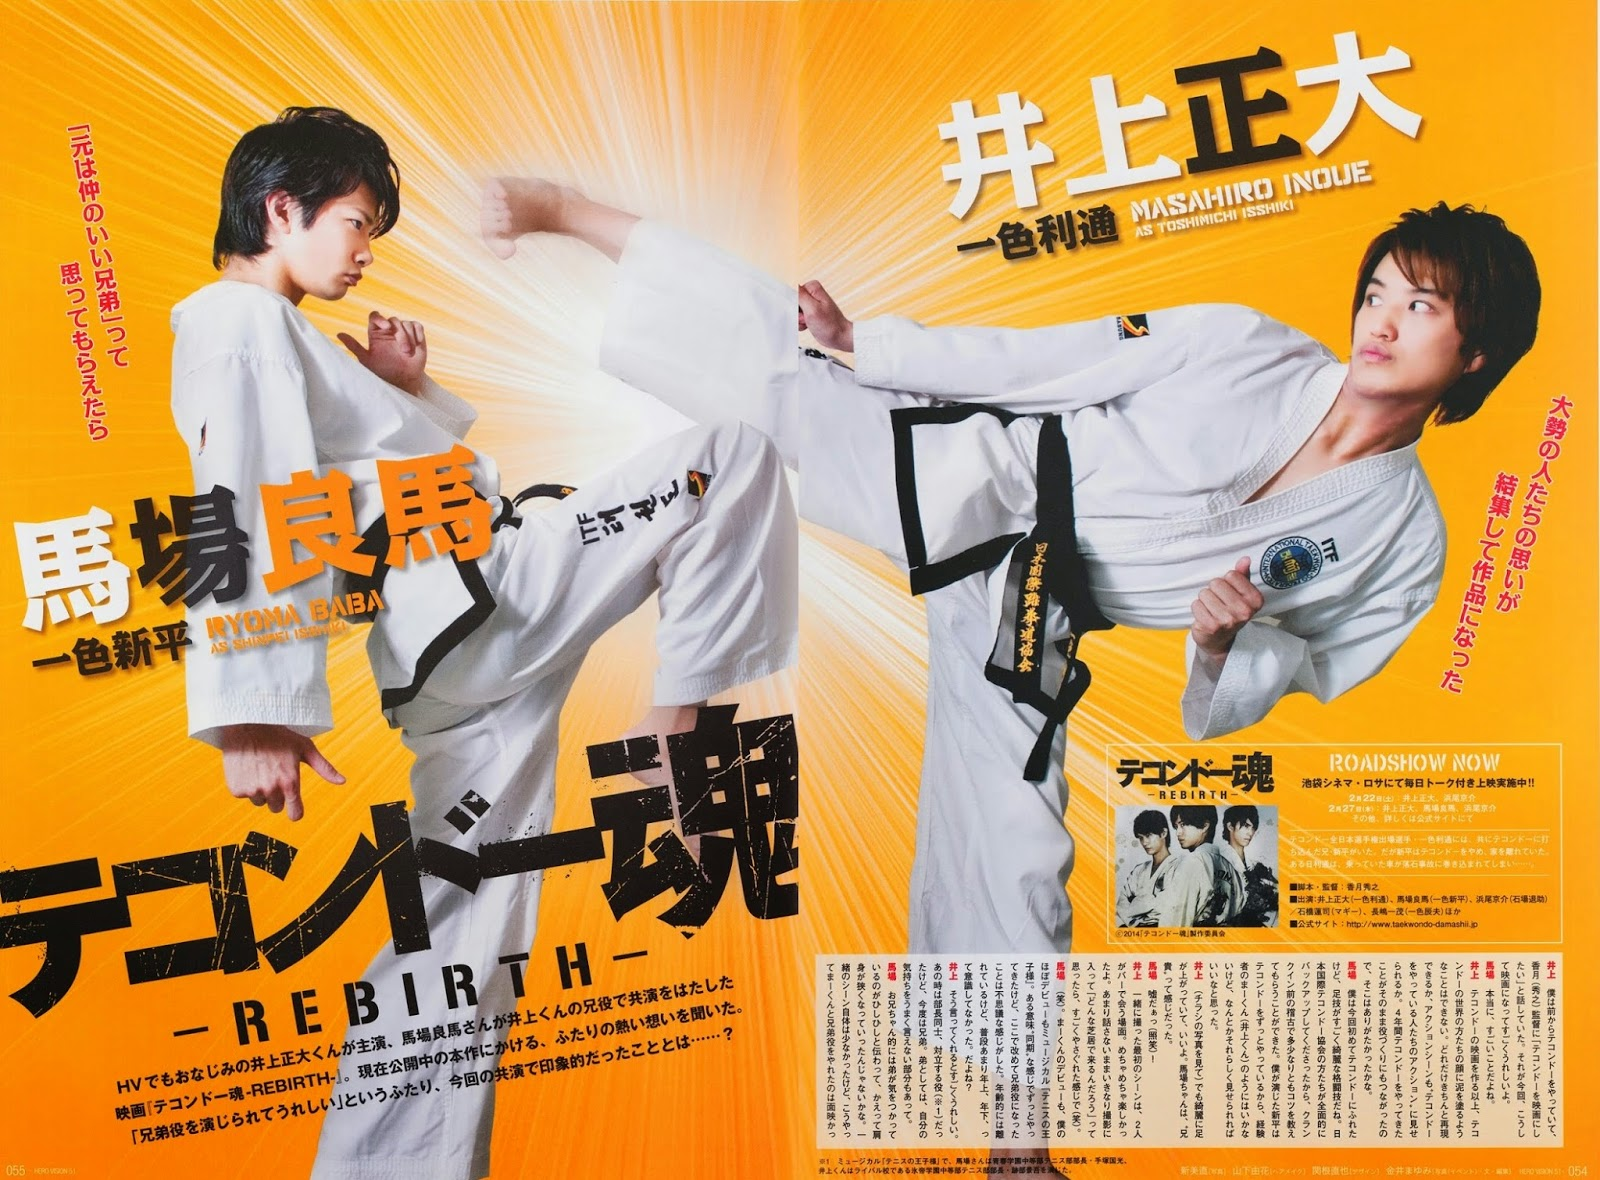 The Power Is On: Ryoma Baba Et Masahiro Inoue Font La ...